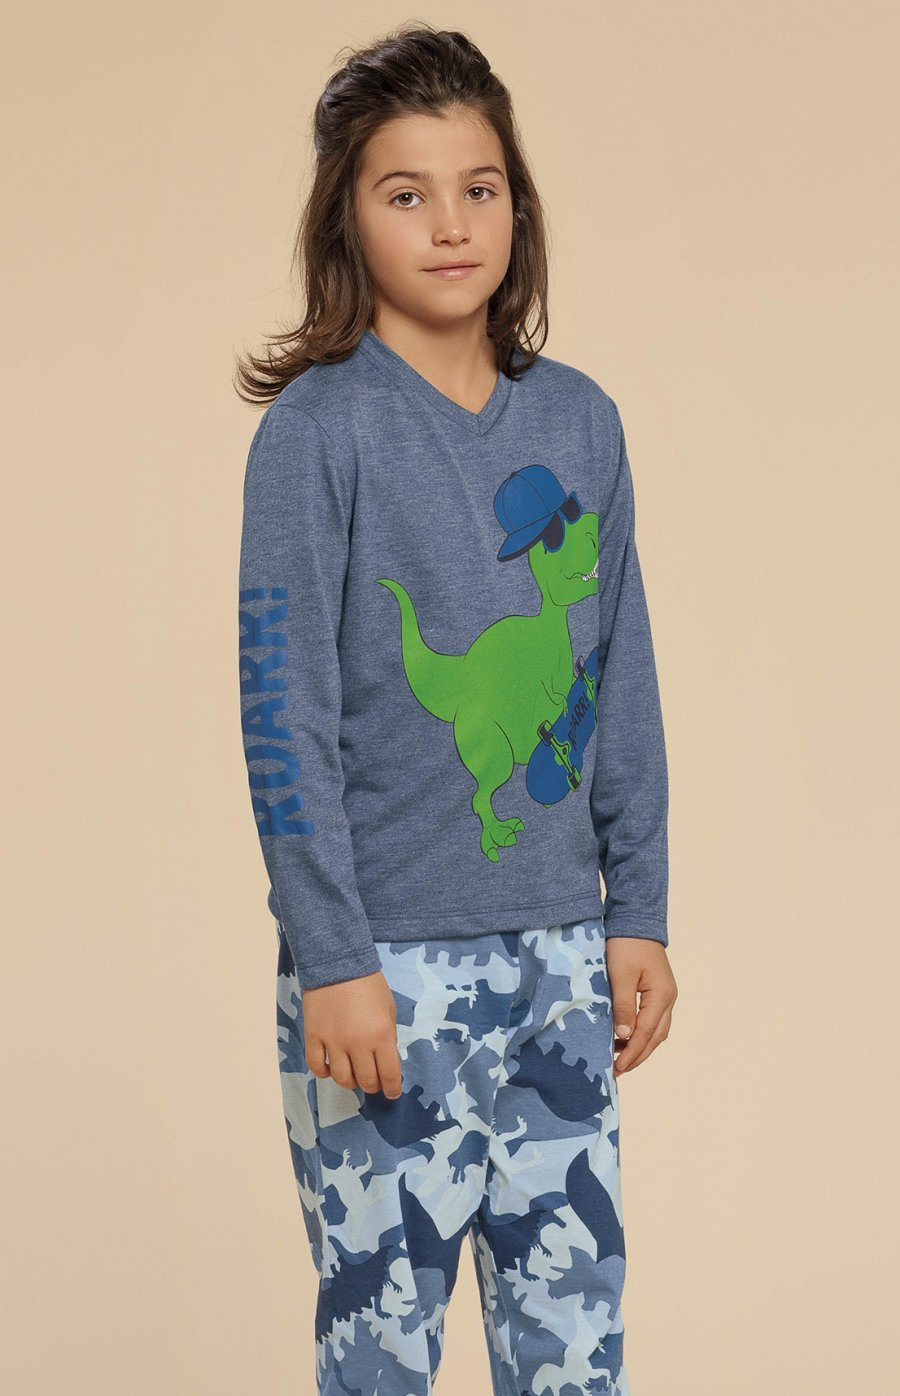 Pijama Infantil Meia Malha Dino Inverno 2019 CLOUD CLUB